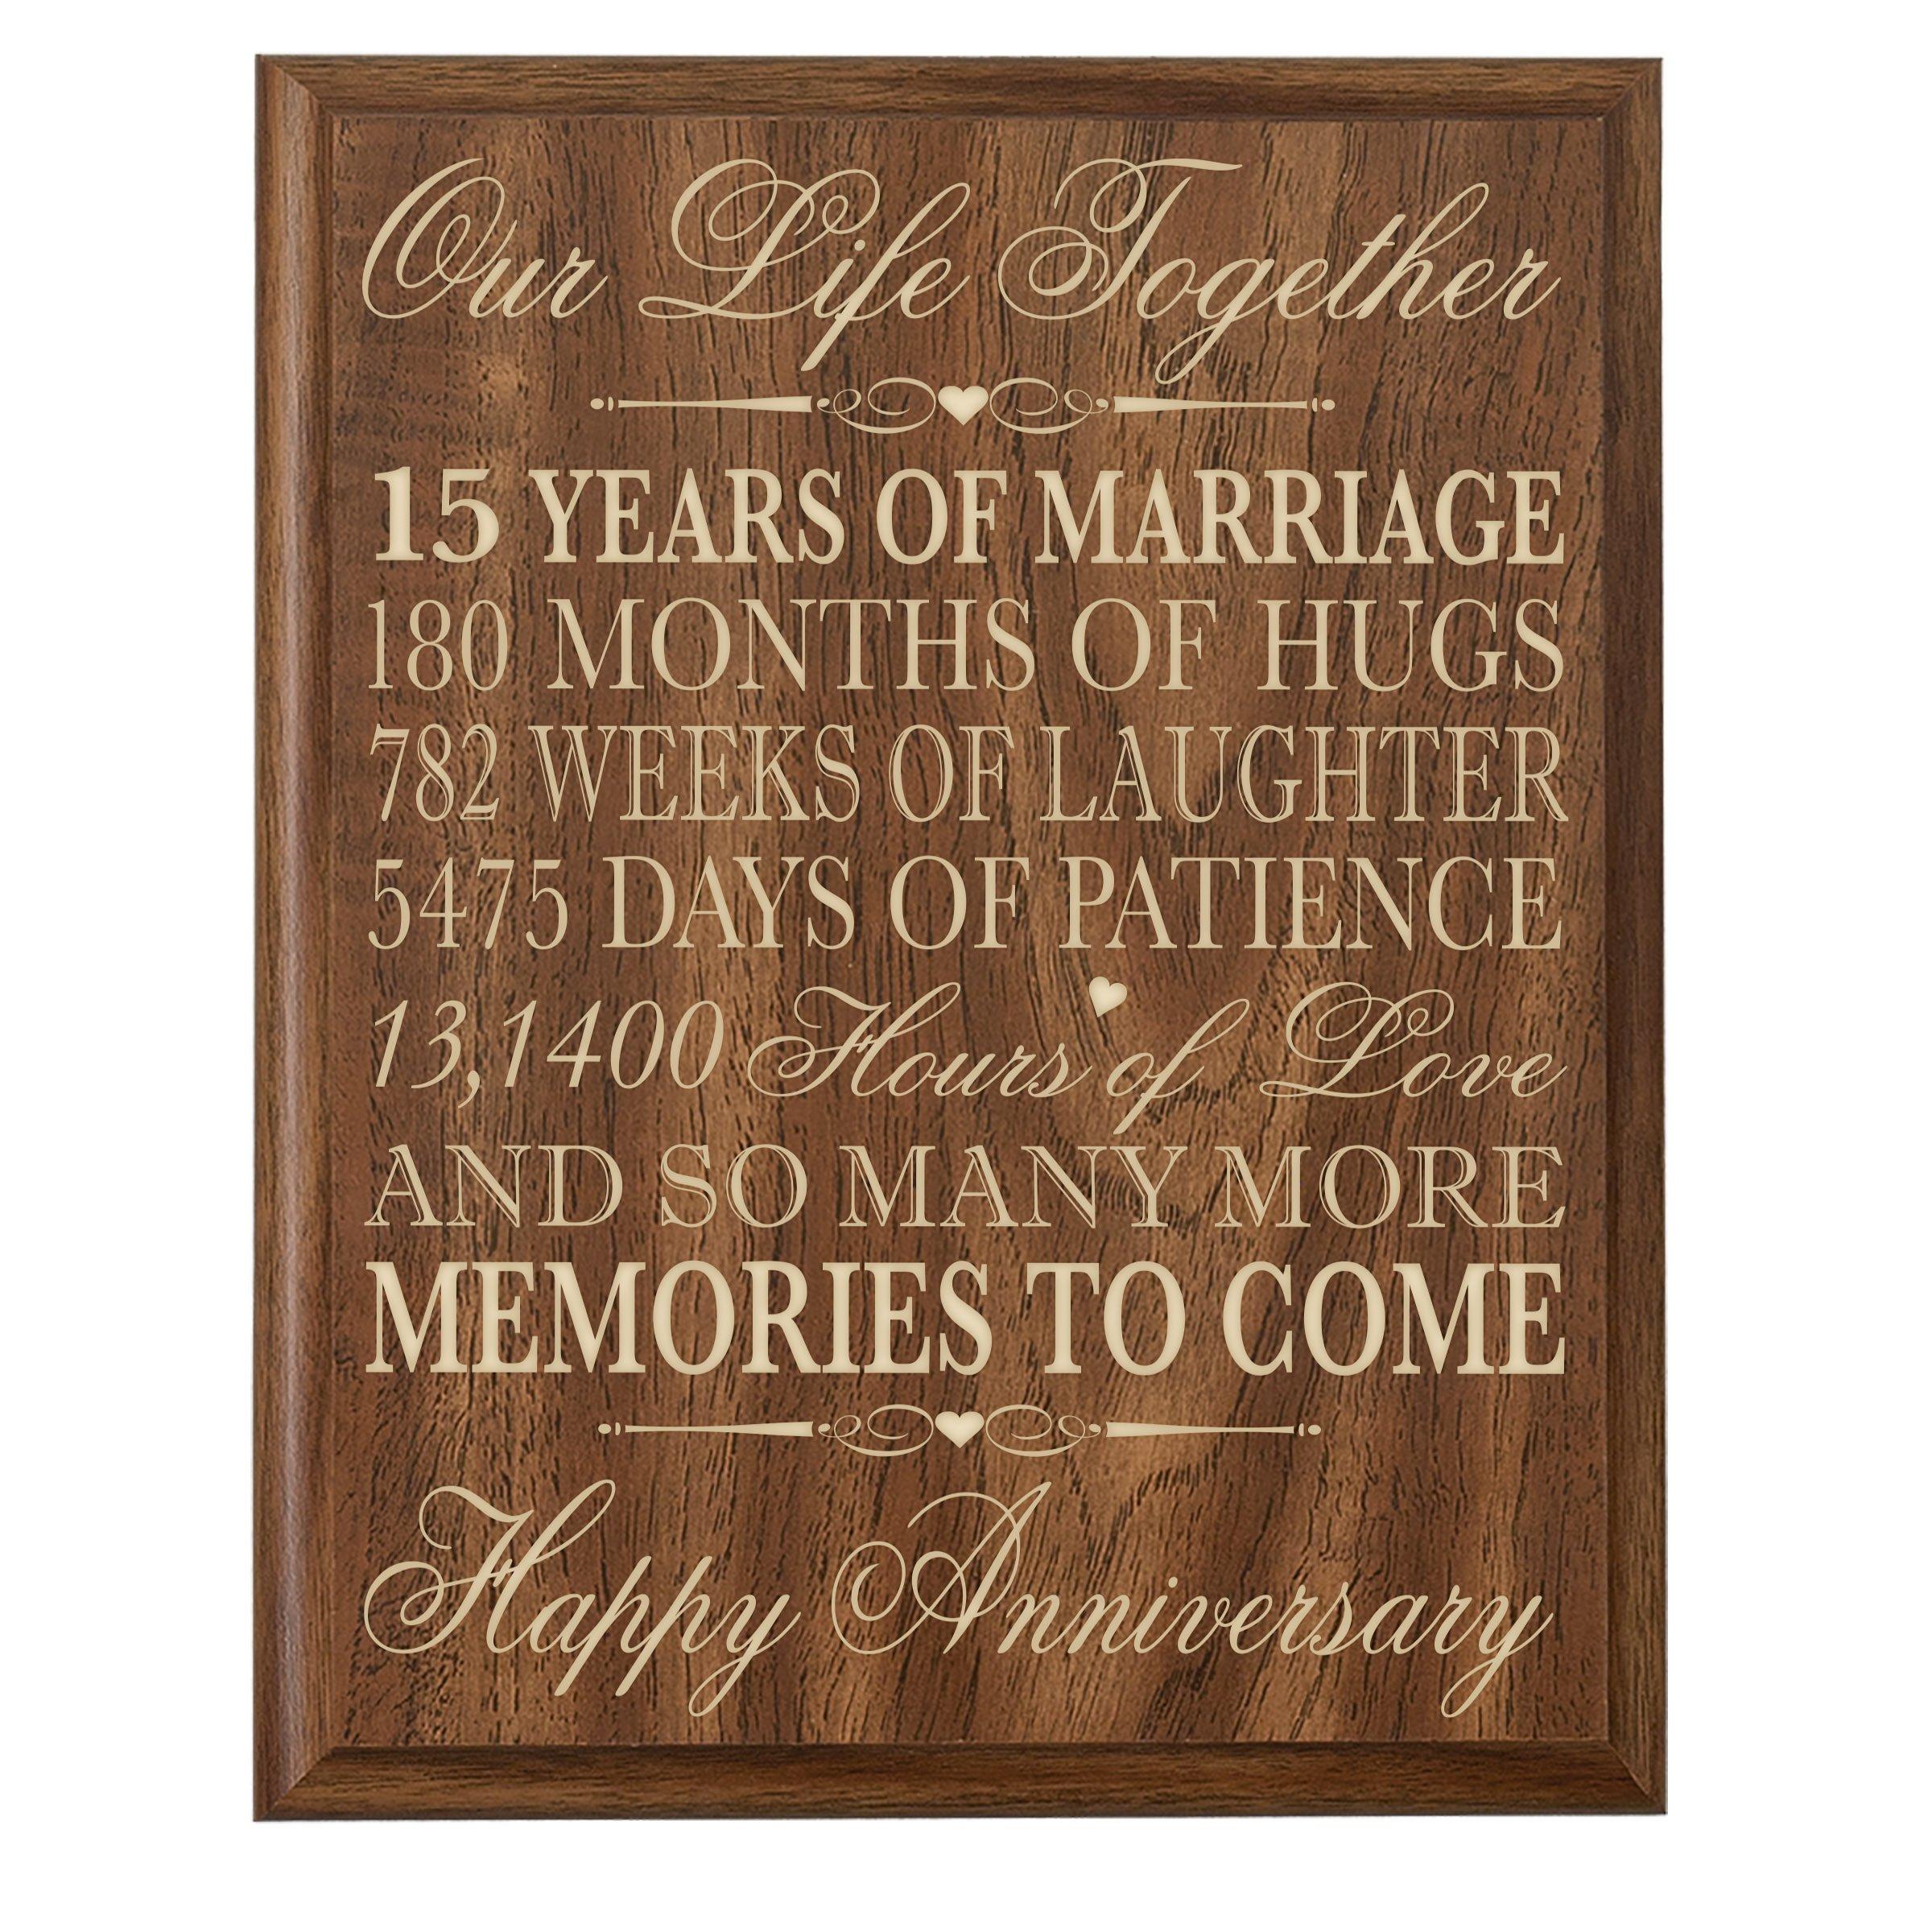 15 Year Wedding Anniversary Sayings: Buy 15th Wedding Anniversary Gift For Couple,15th